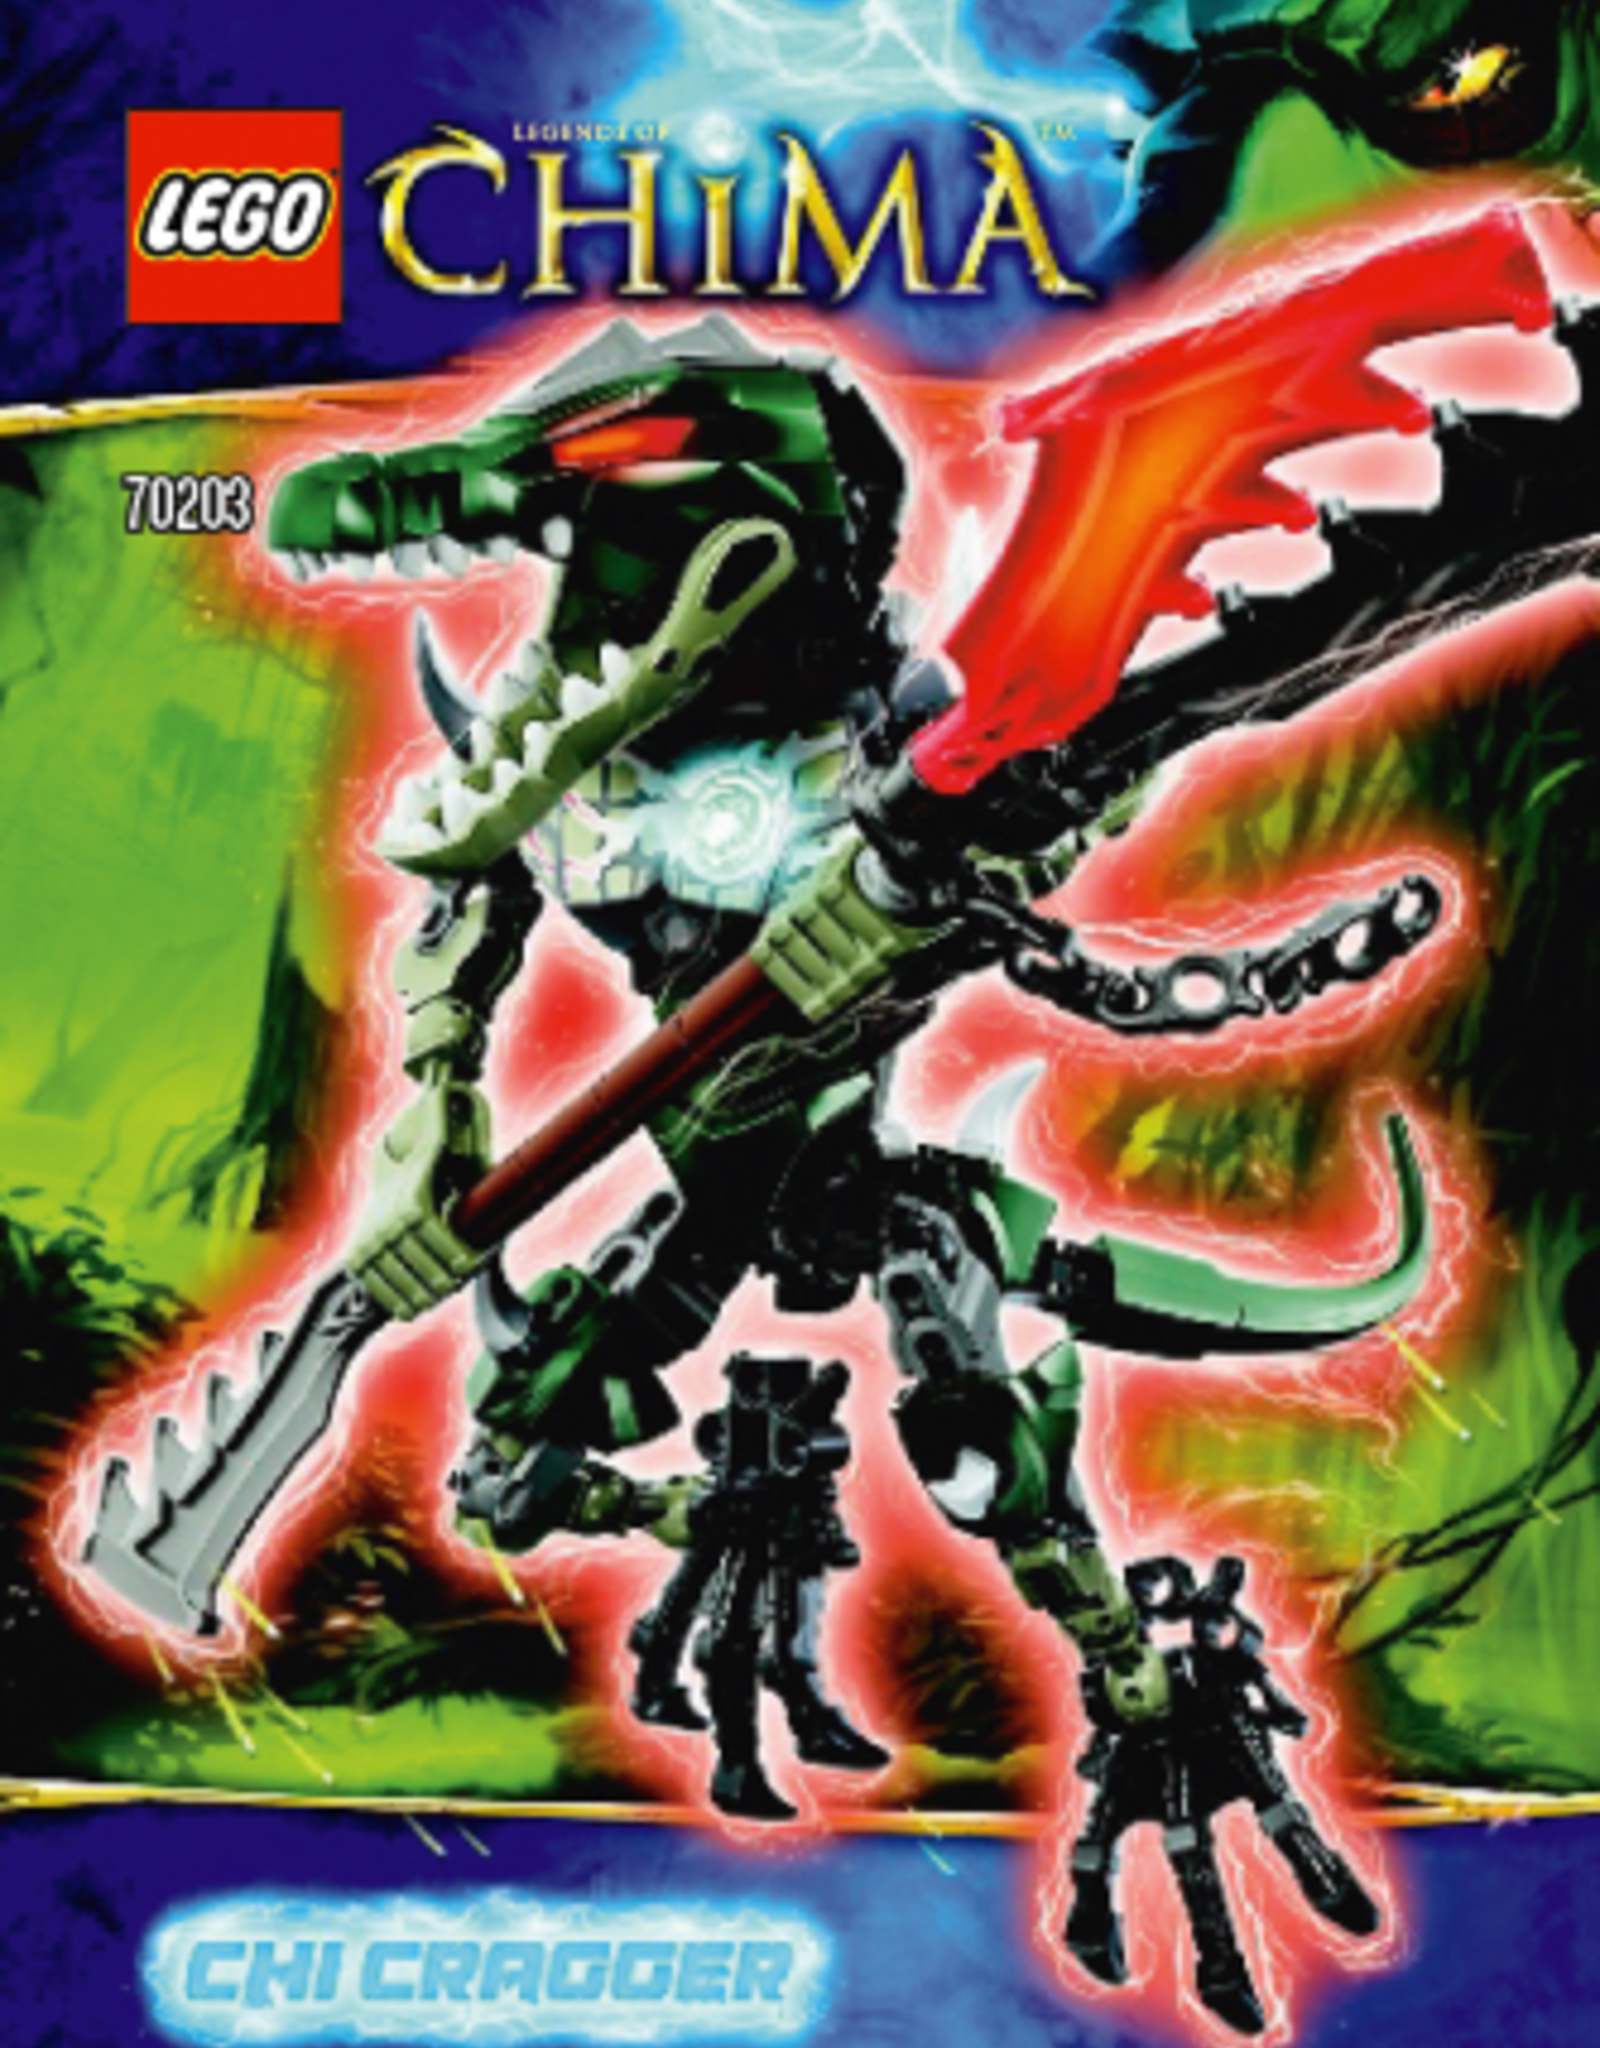 LEGO LEGO 70203 CHI Cragger CHIMA